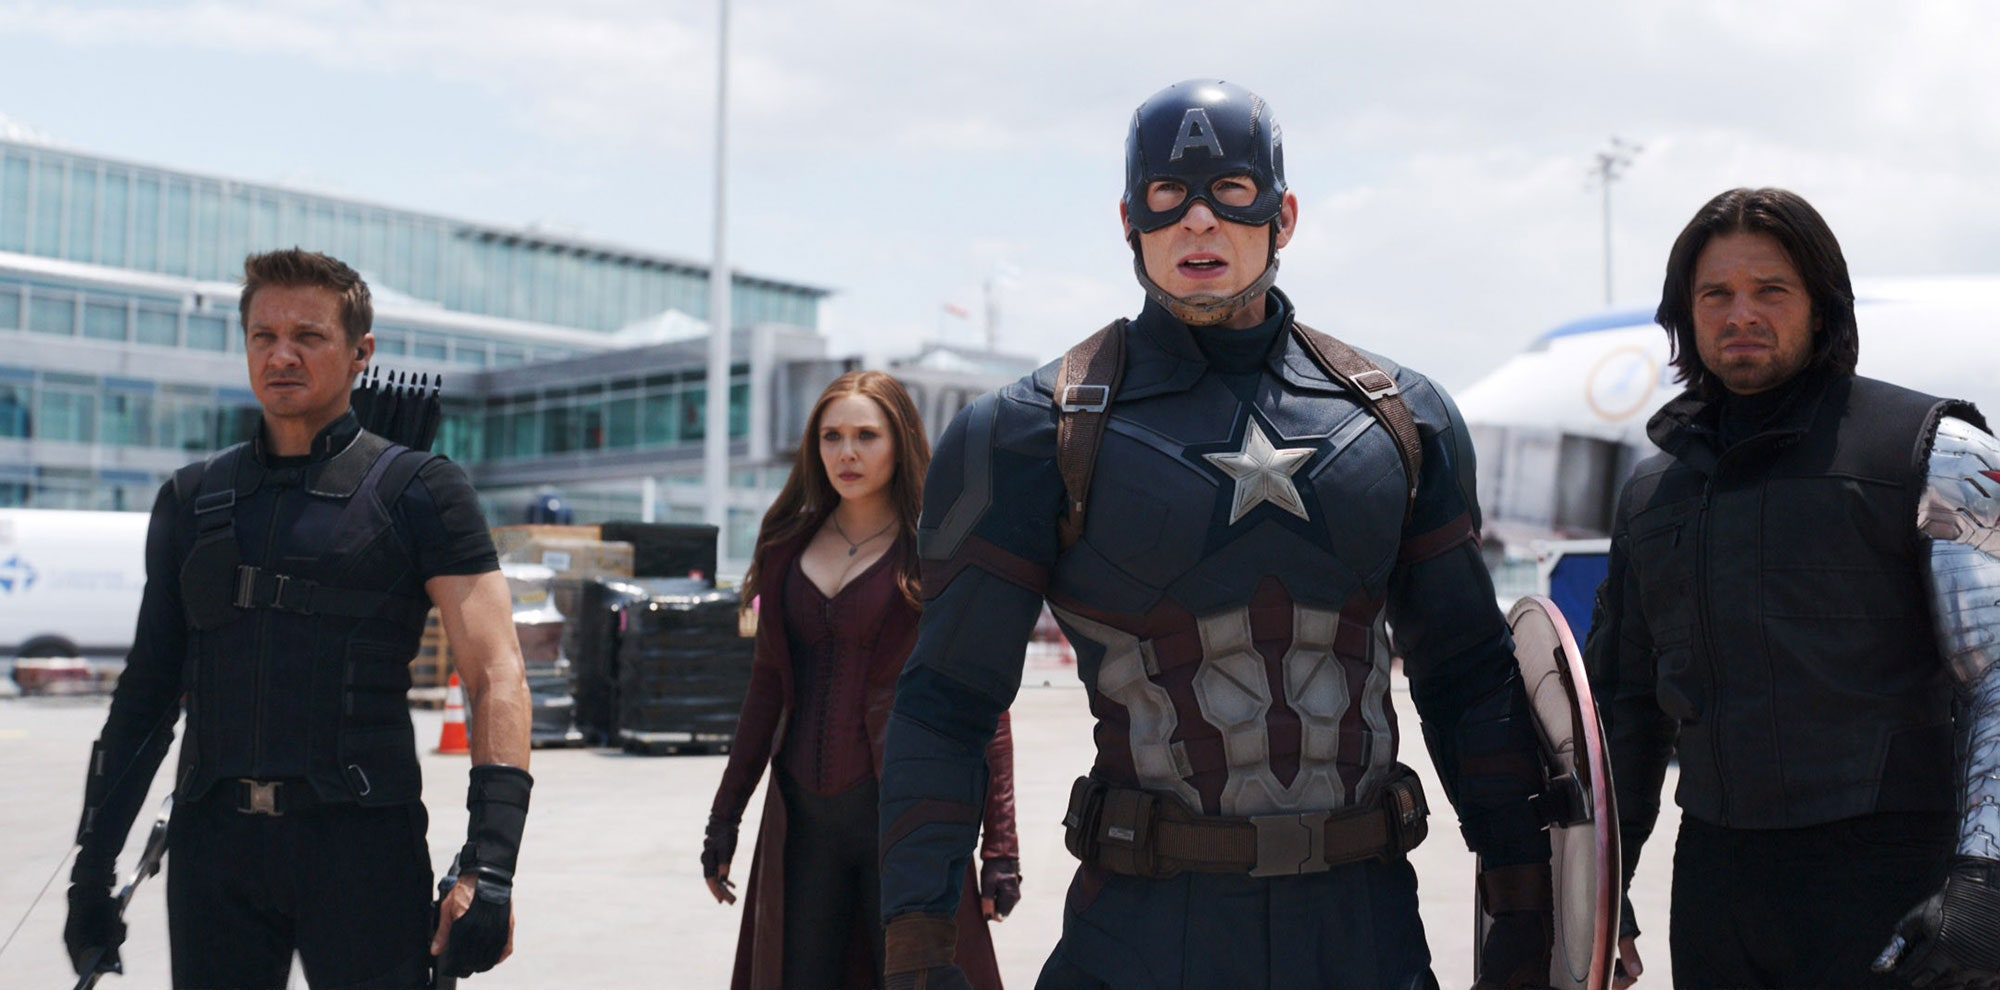 A still from Captain America: Civil War showcasing team Captain America